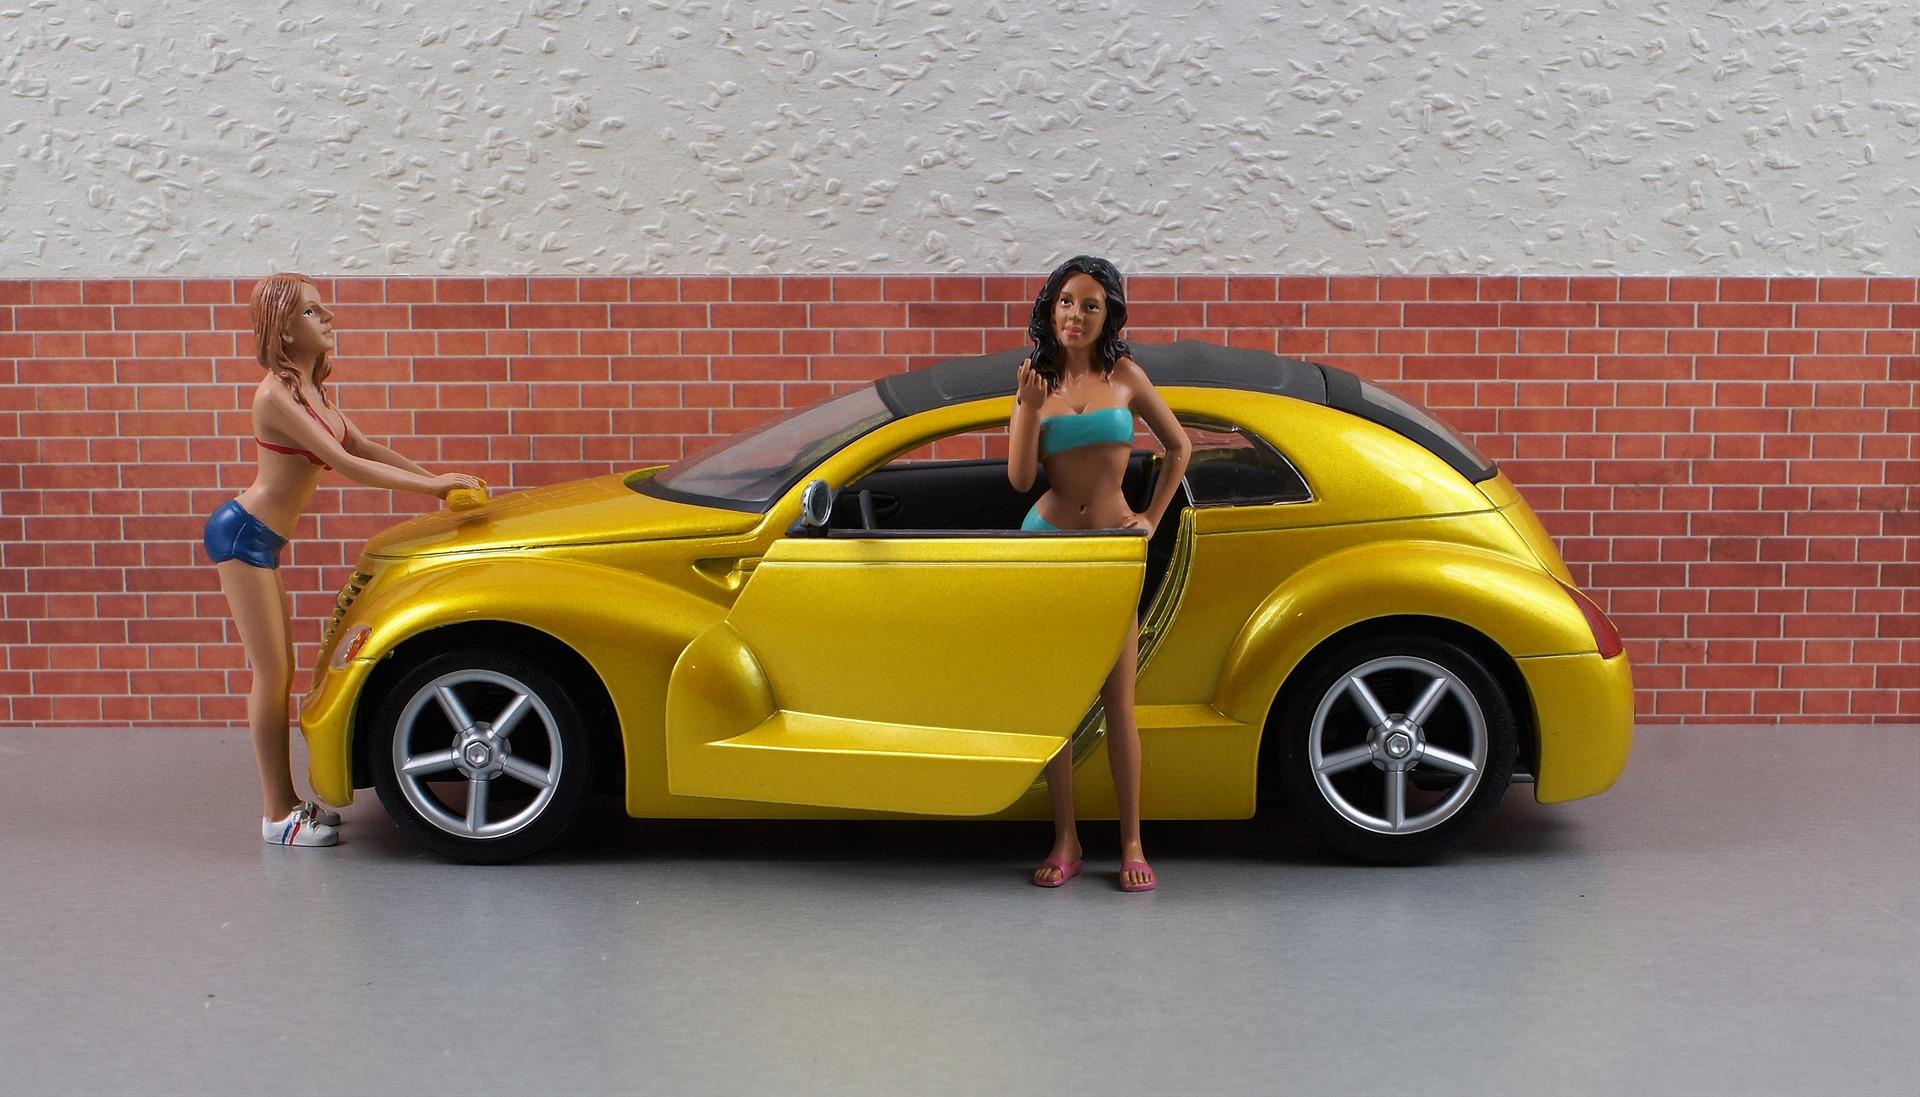 Wax Mobil Berkualitas